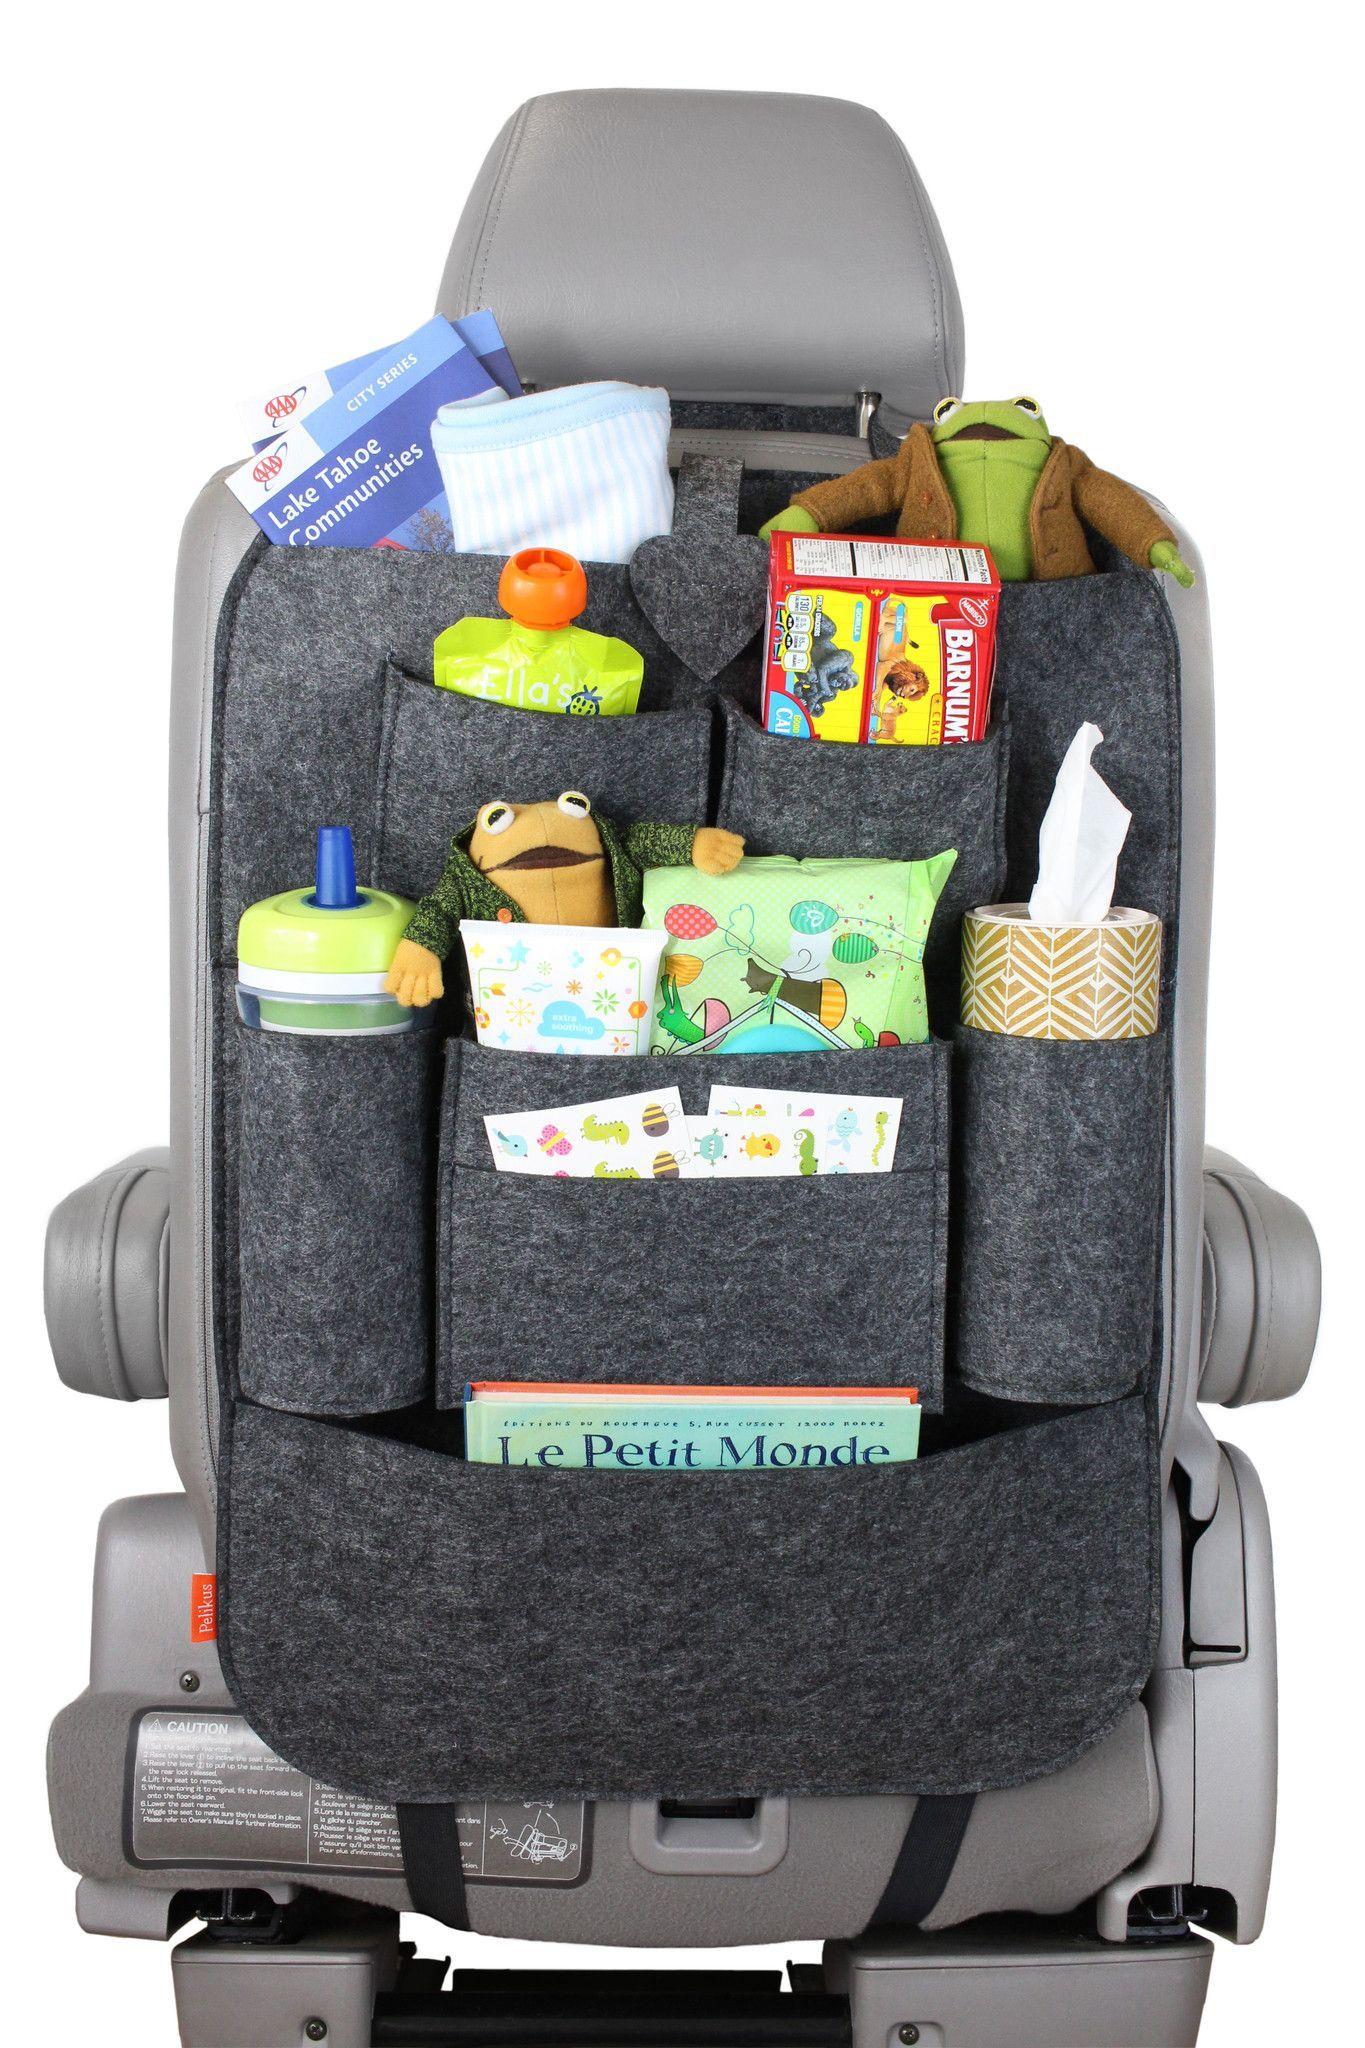 PelikusR Felt Multi Pocket Travel Car Seat Back Organizer Wet Ones Interactive Book IPad Dry Snacks Sippy Cup Stuffed Animal Kleenex Baby Wipes